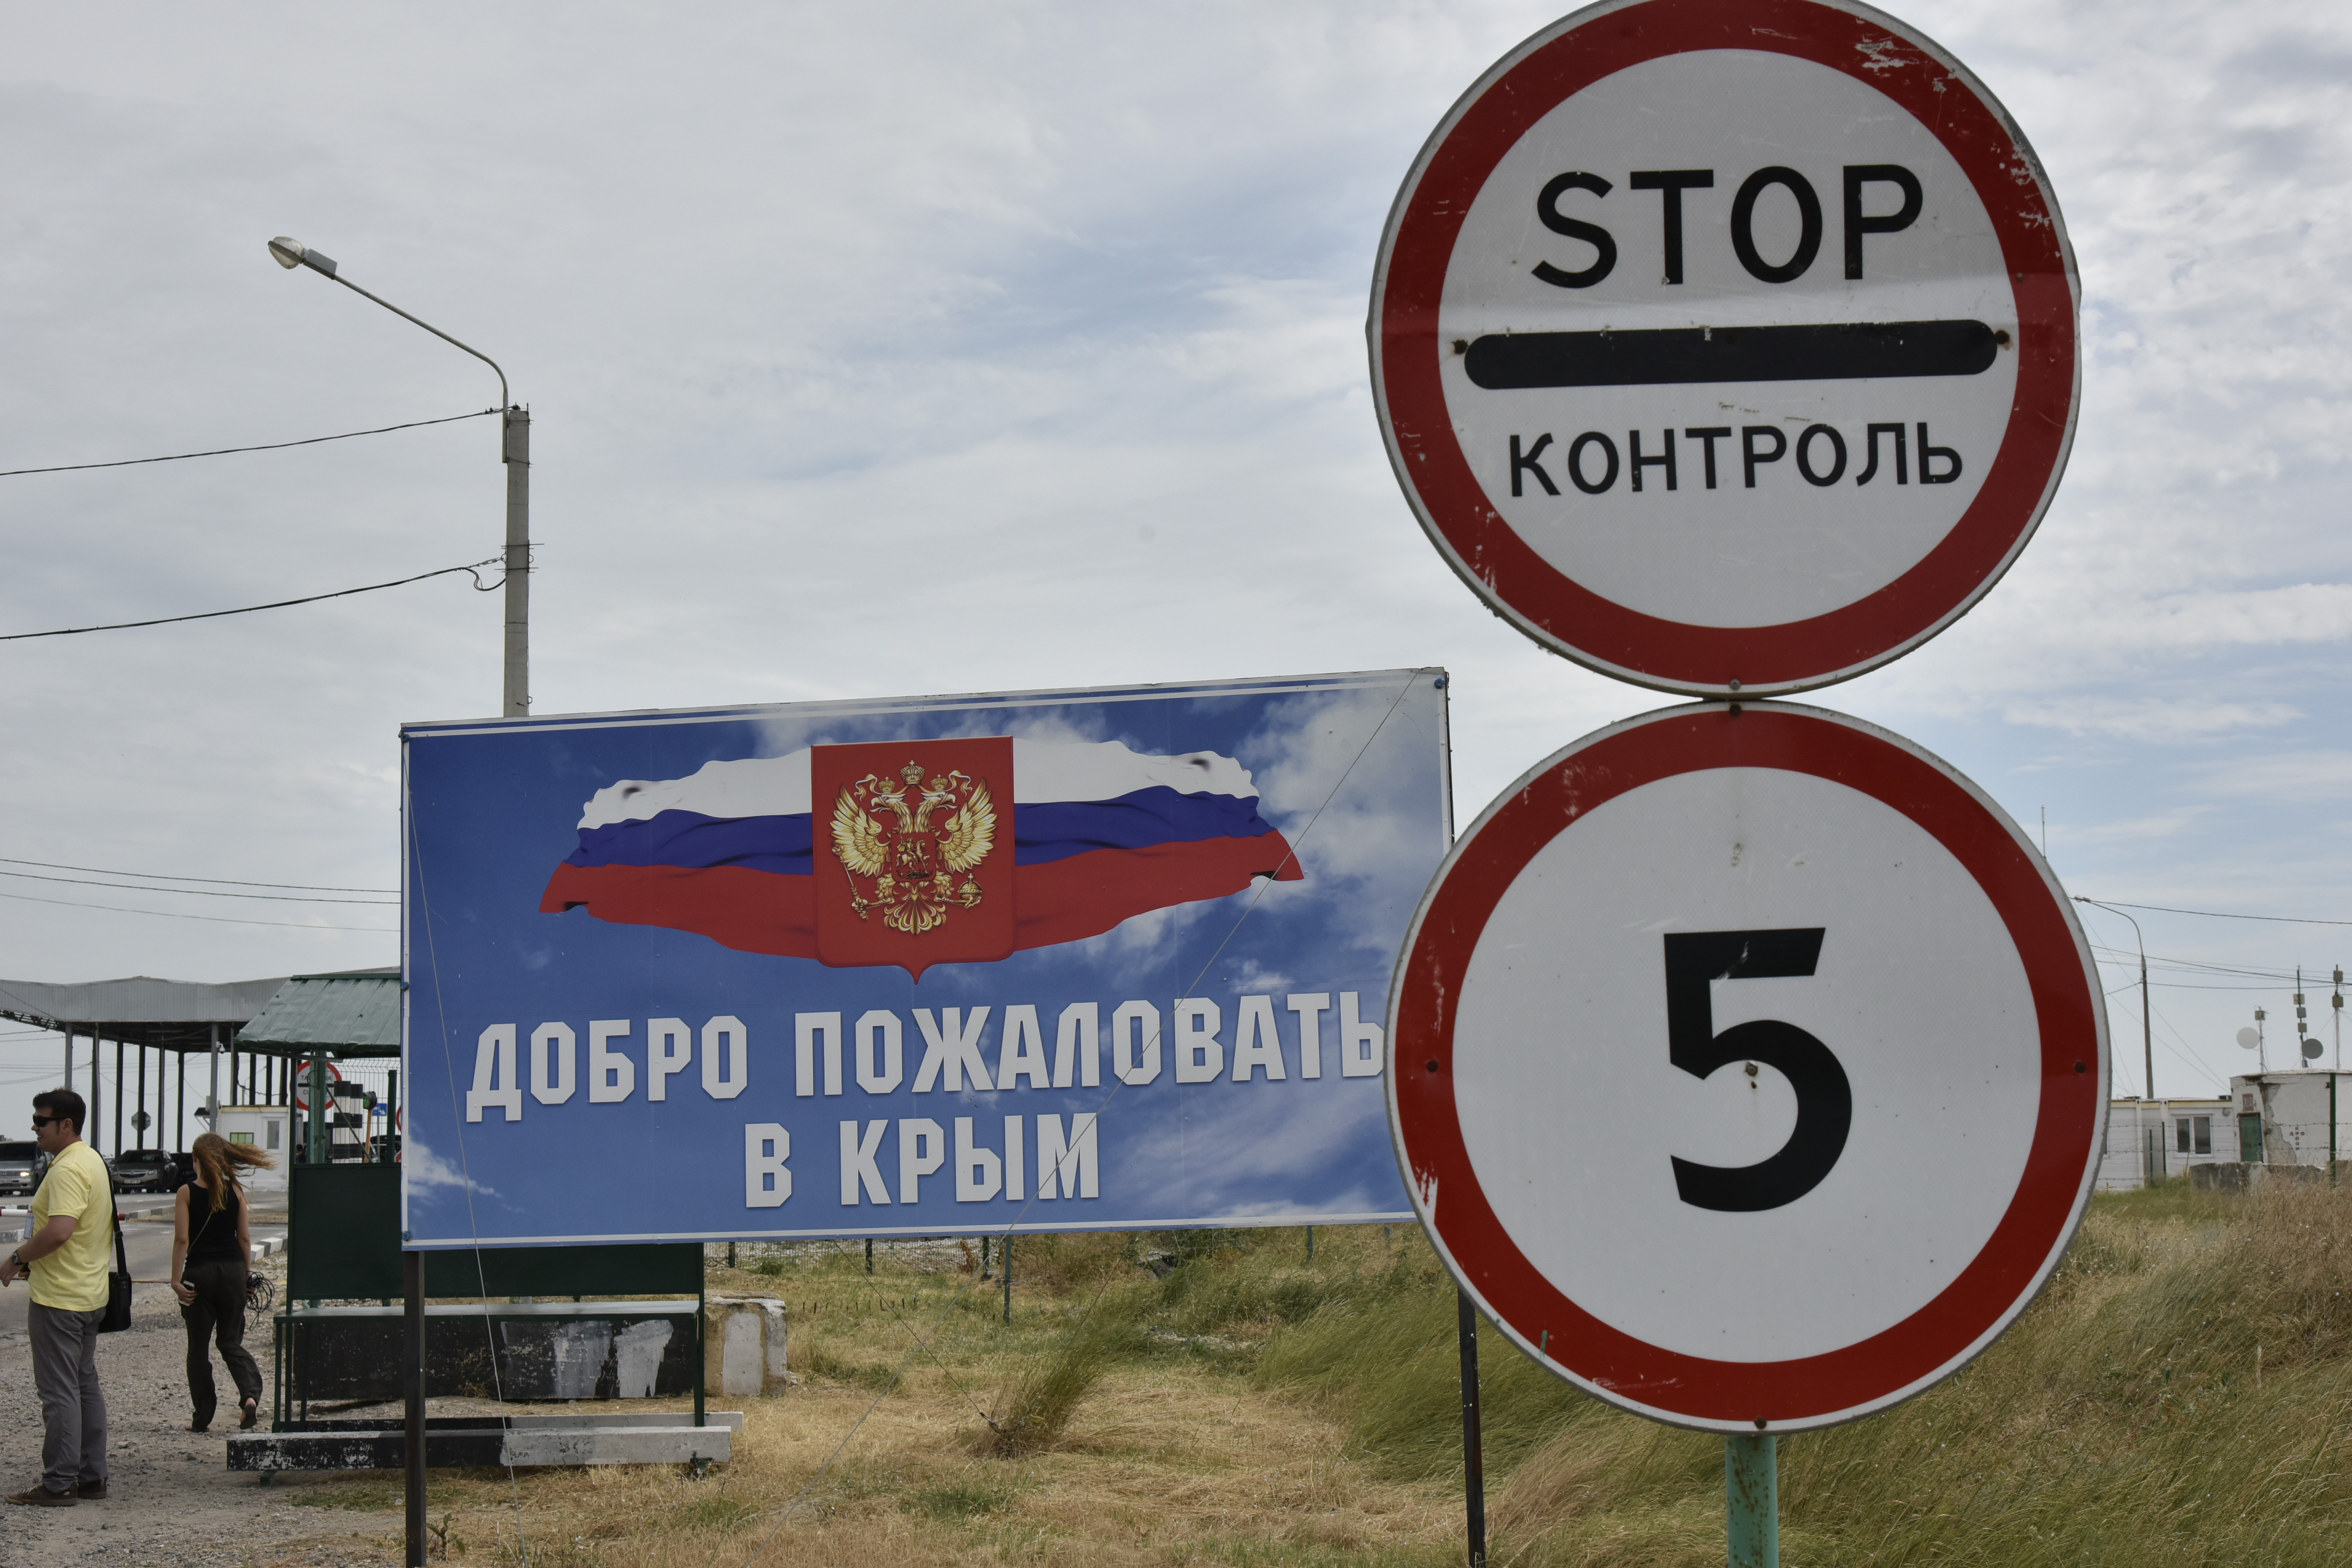 <p>Фото: &copy;РИА Новости/Александр Полегенько&nbsp;</p>